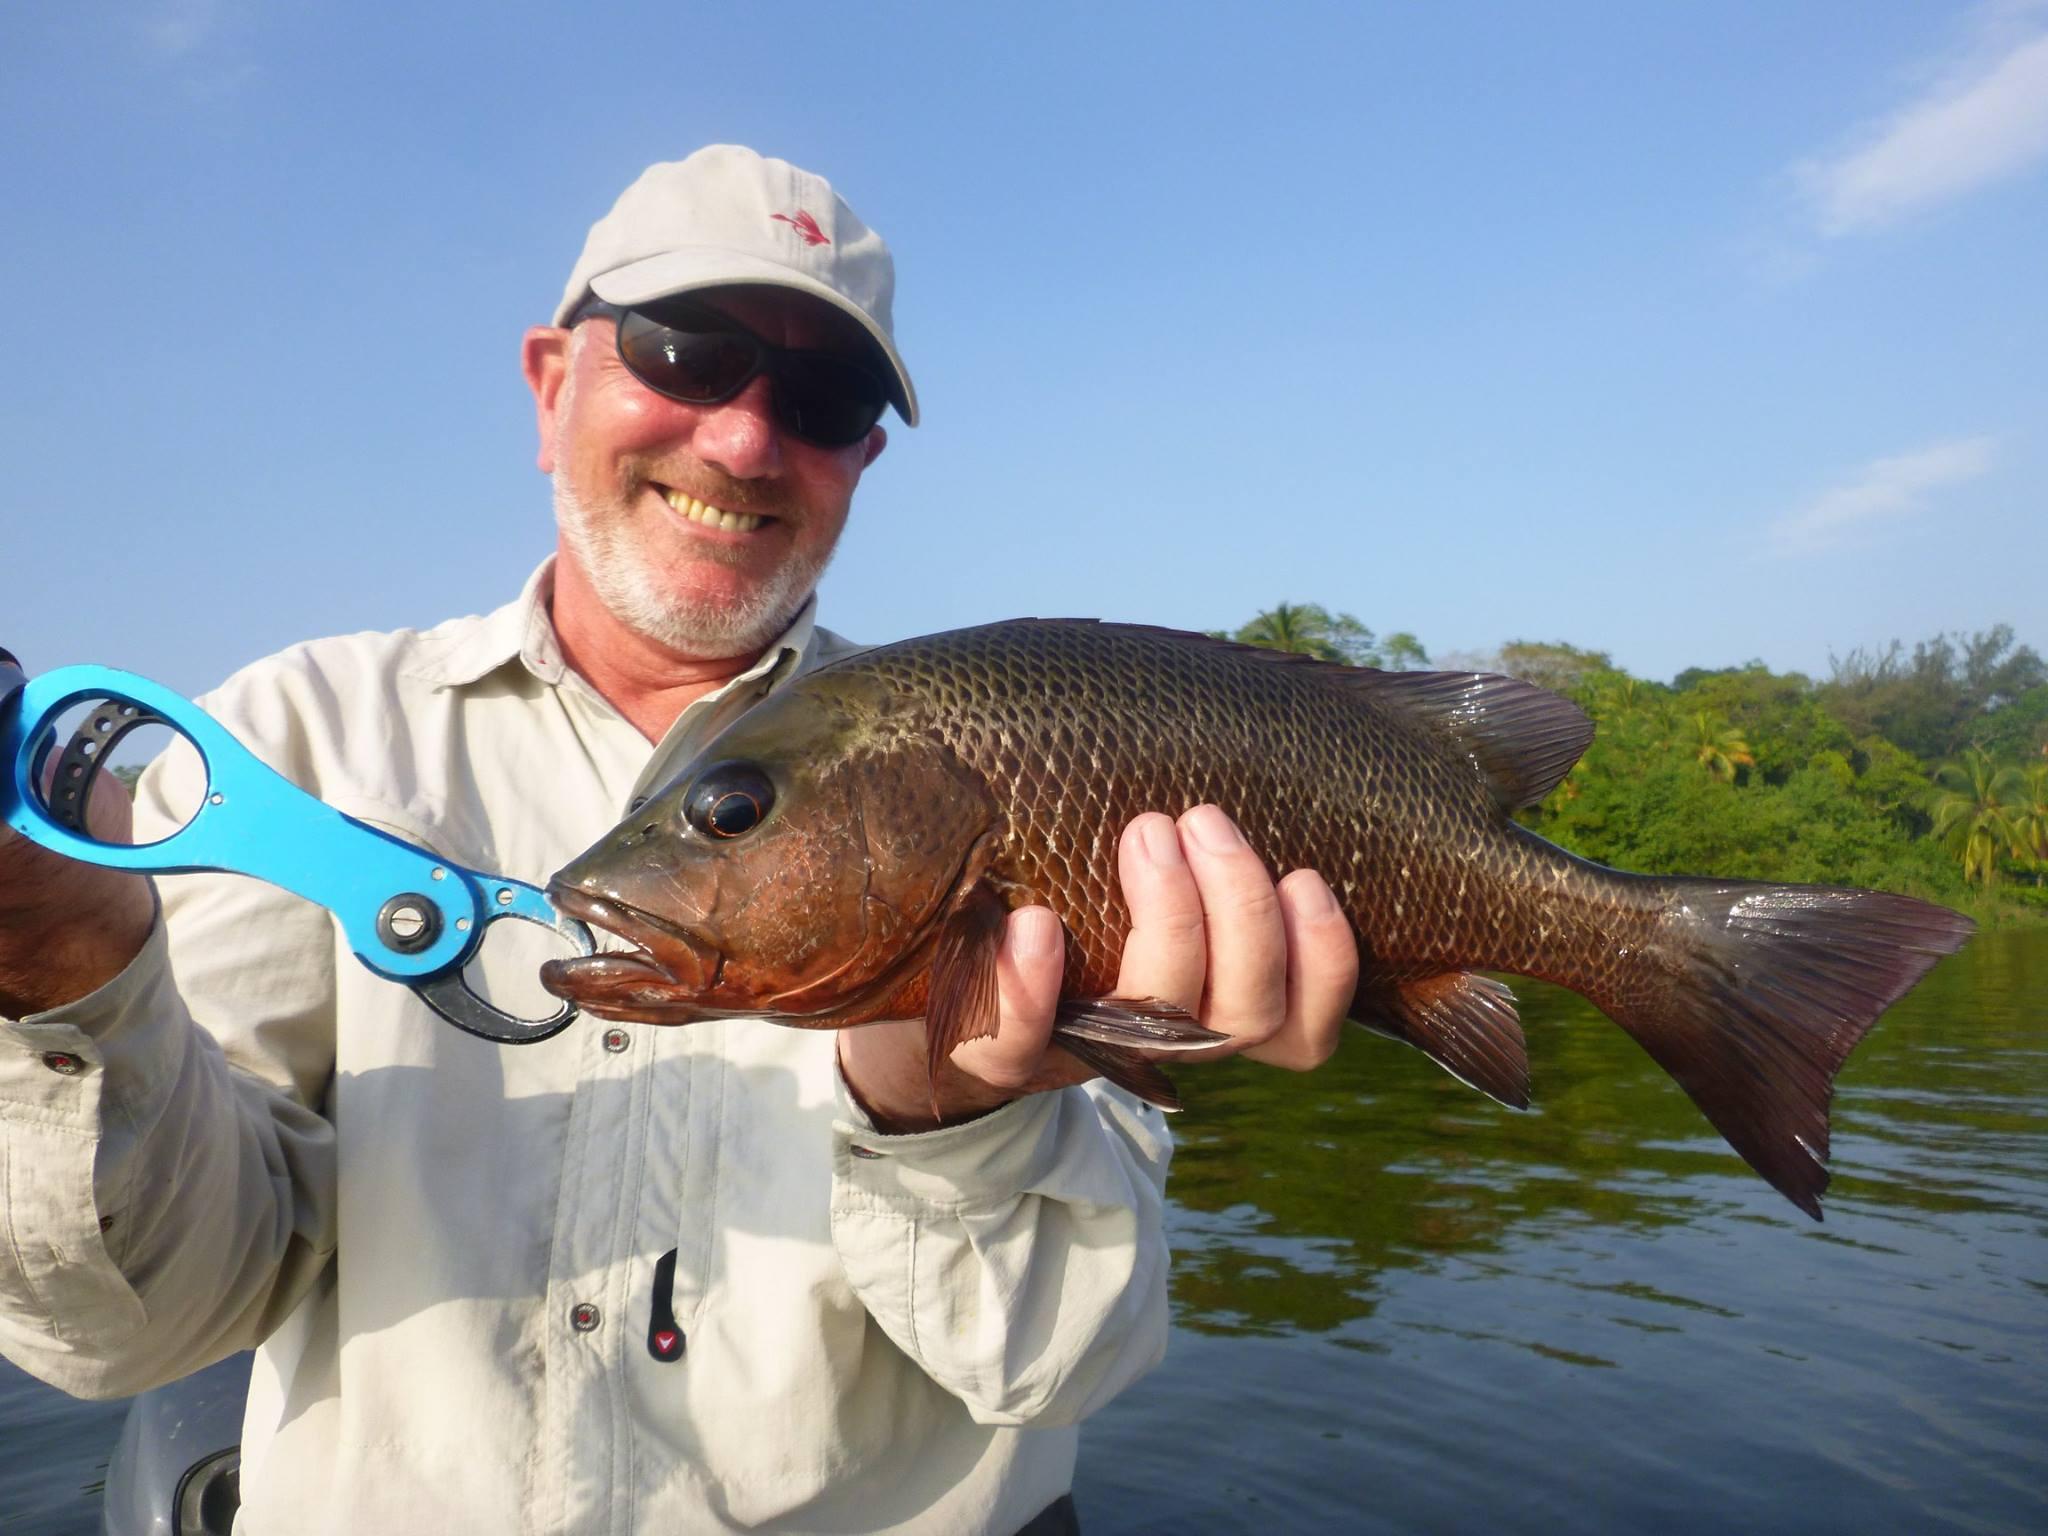 Lure fishing Sri Lanka Bolgoda Lake Mangrove Jack .jpg